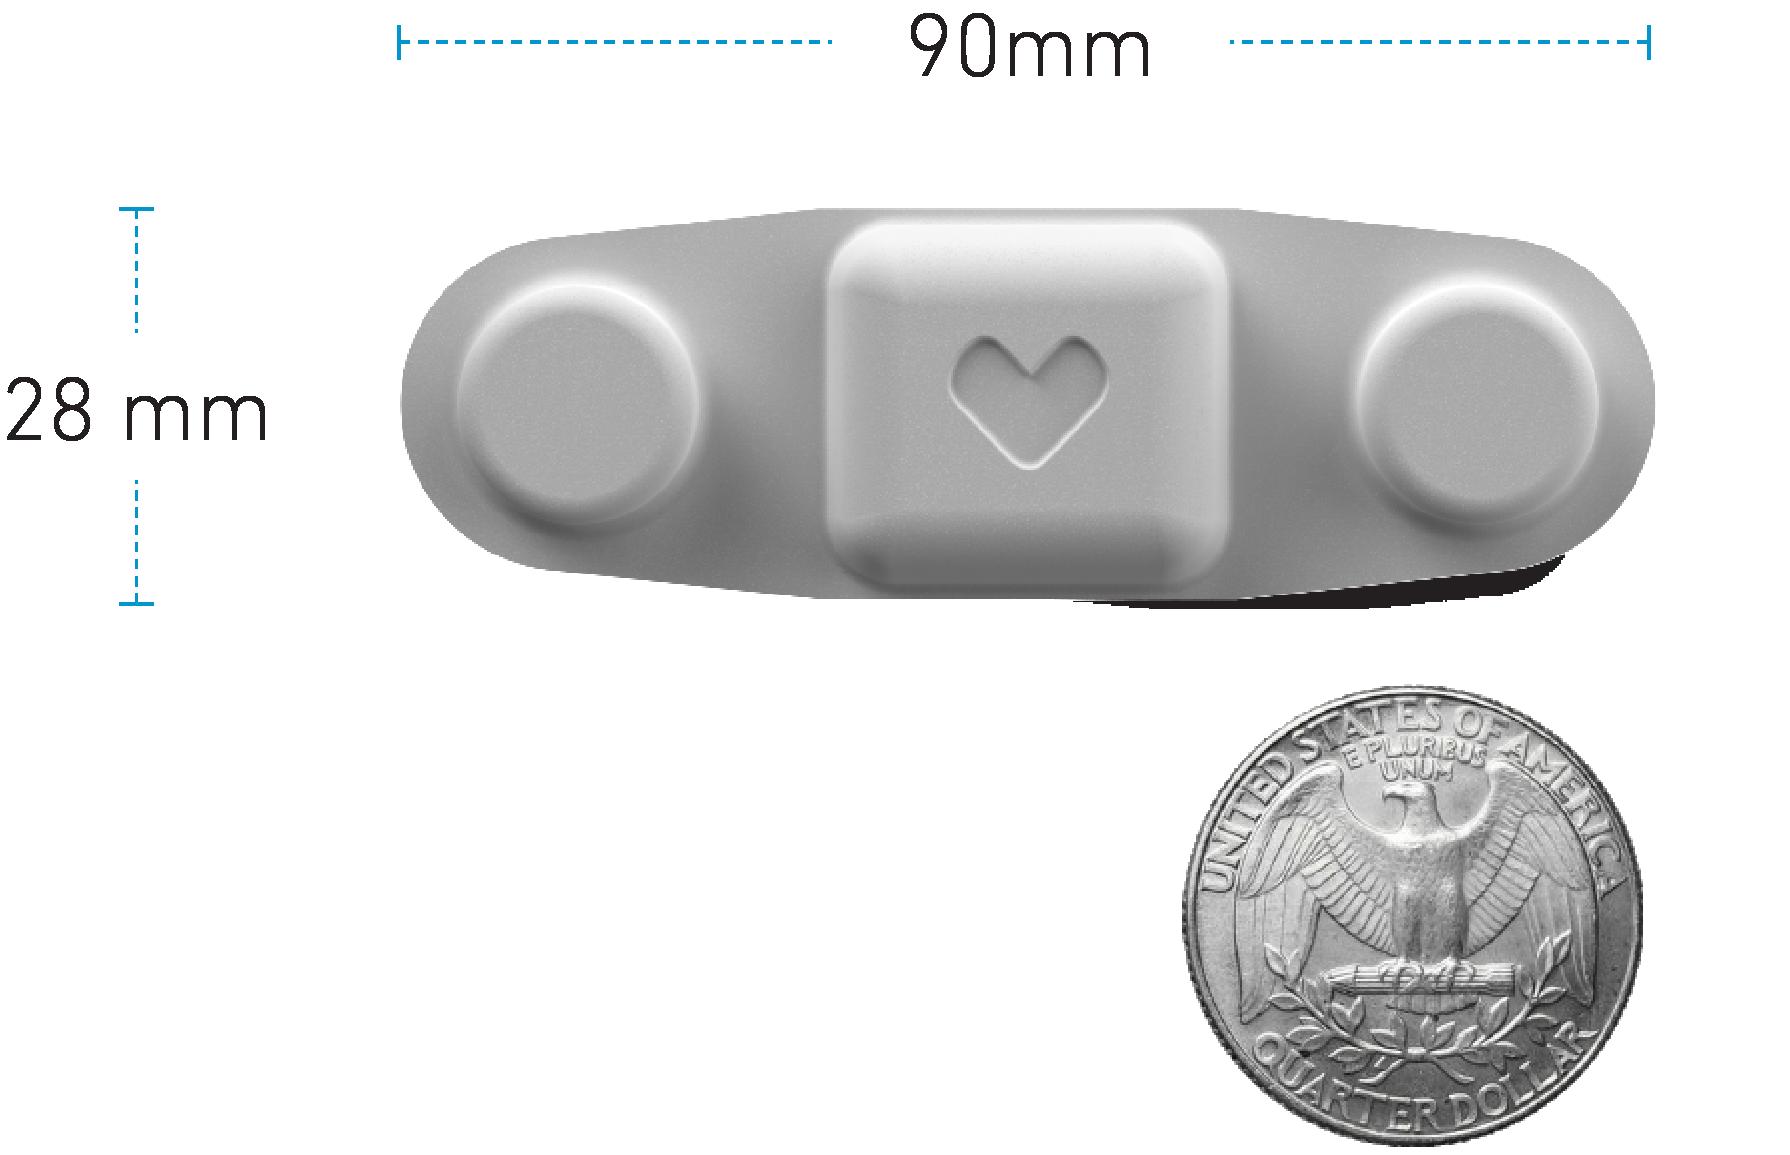 wearable ecg monitor